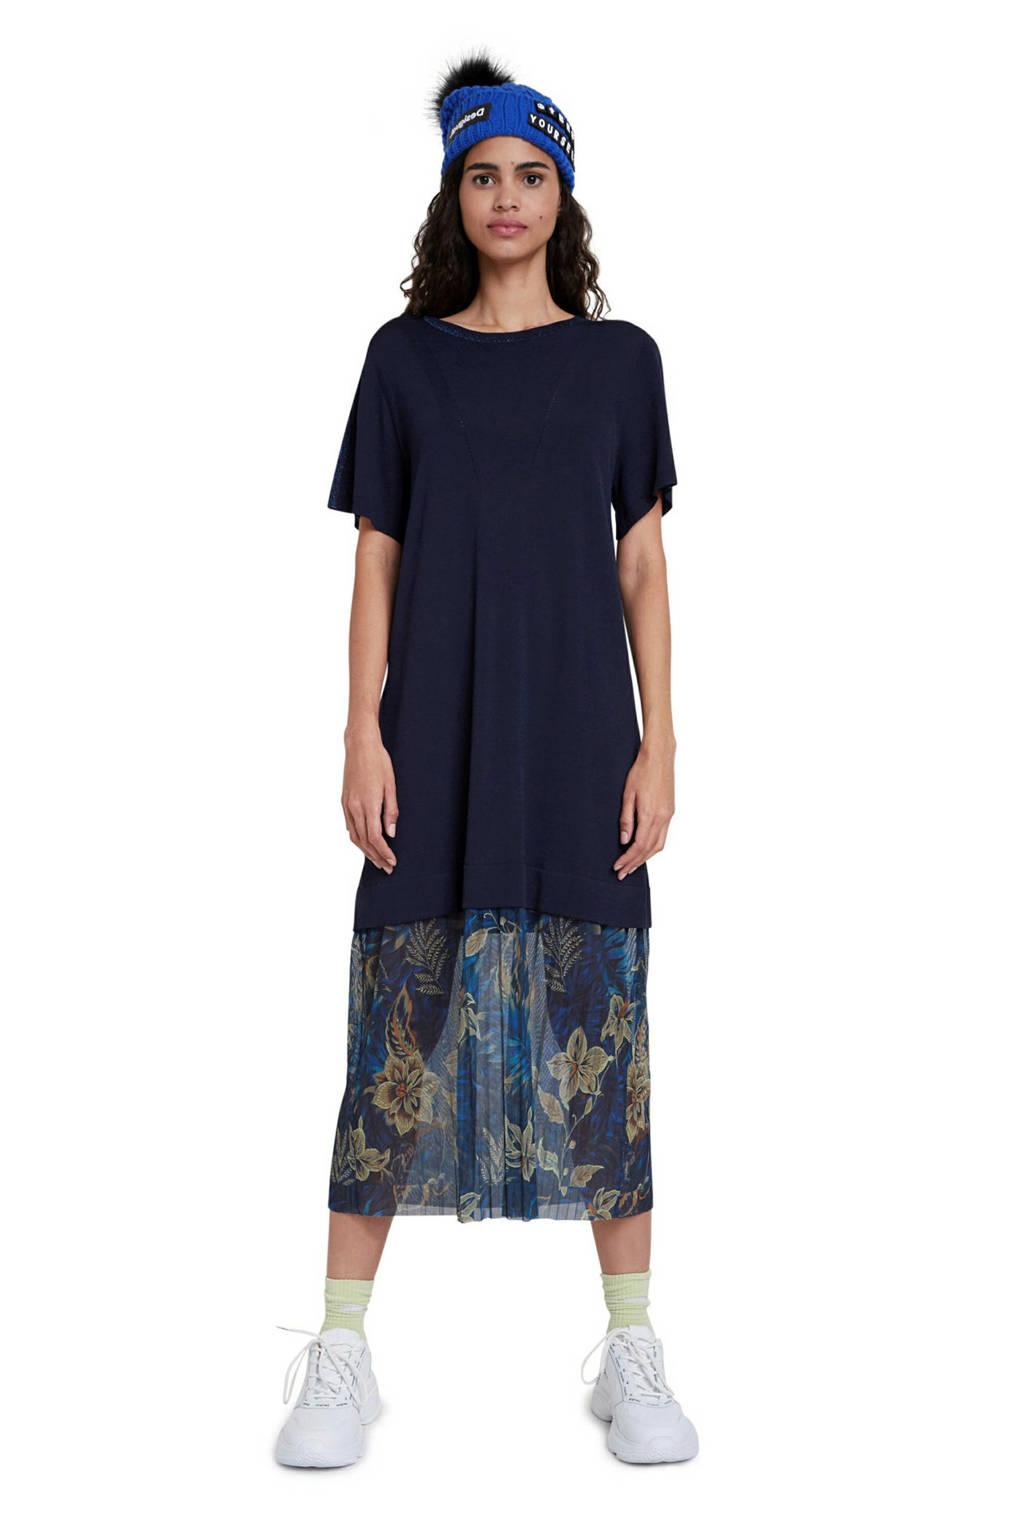 Desigual semi-transparante T-shirtjurk met glitters donkerblauw/blauw, Donkerblauw/blauw